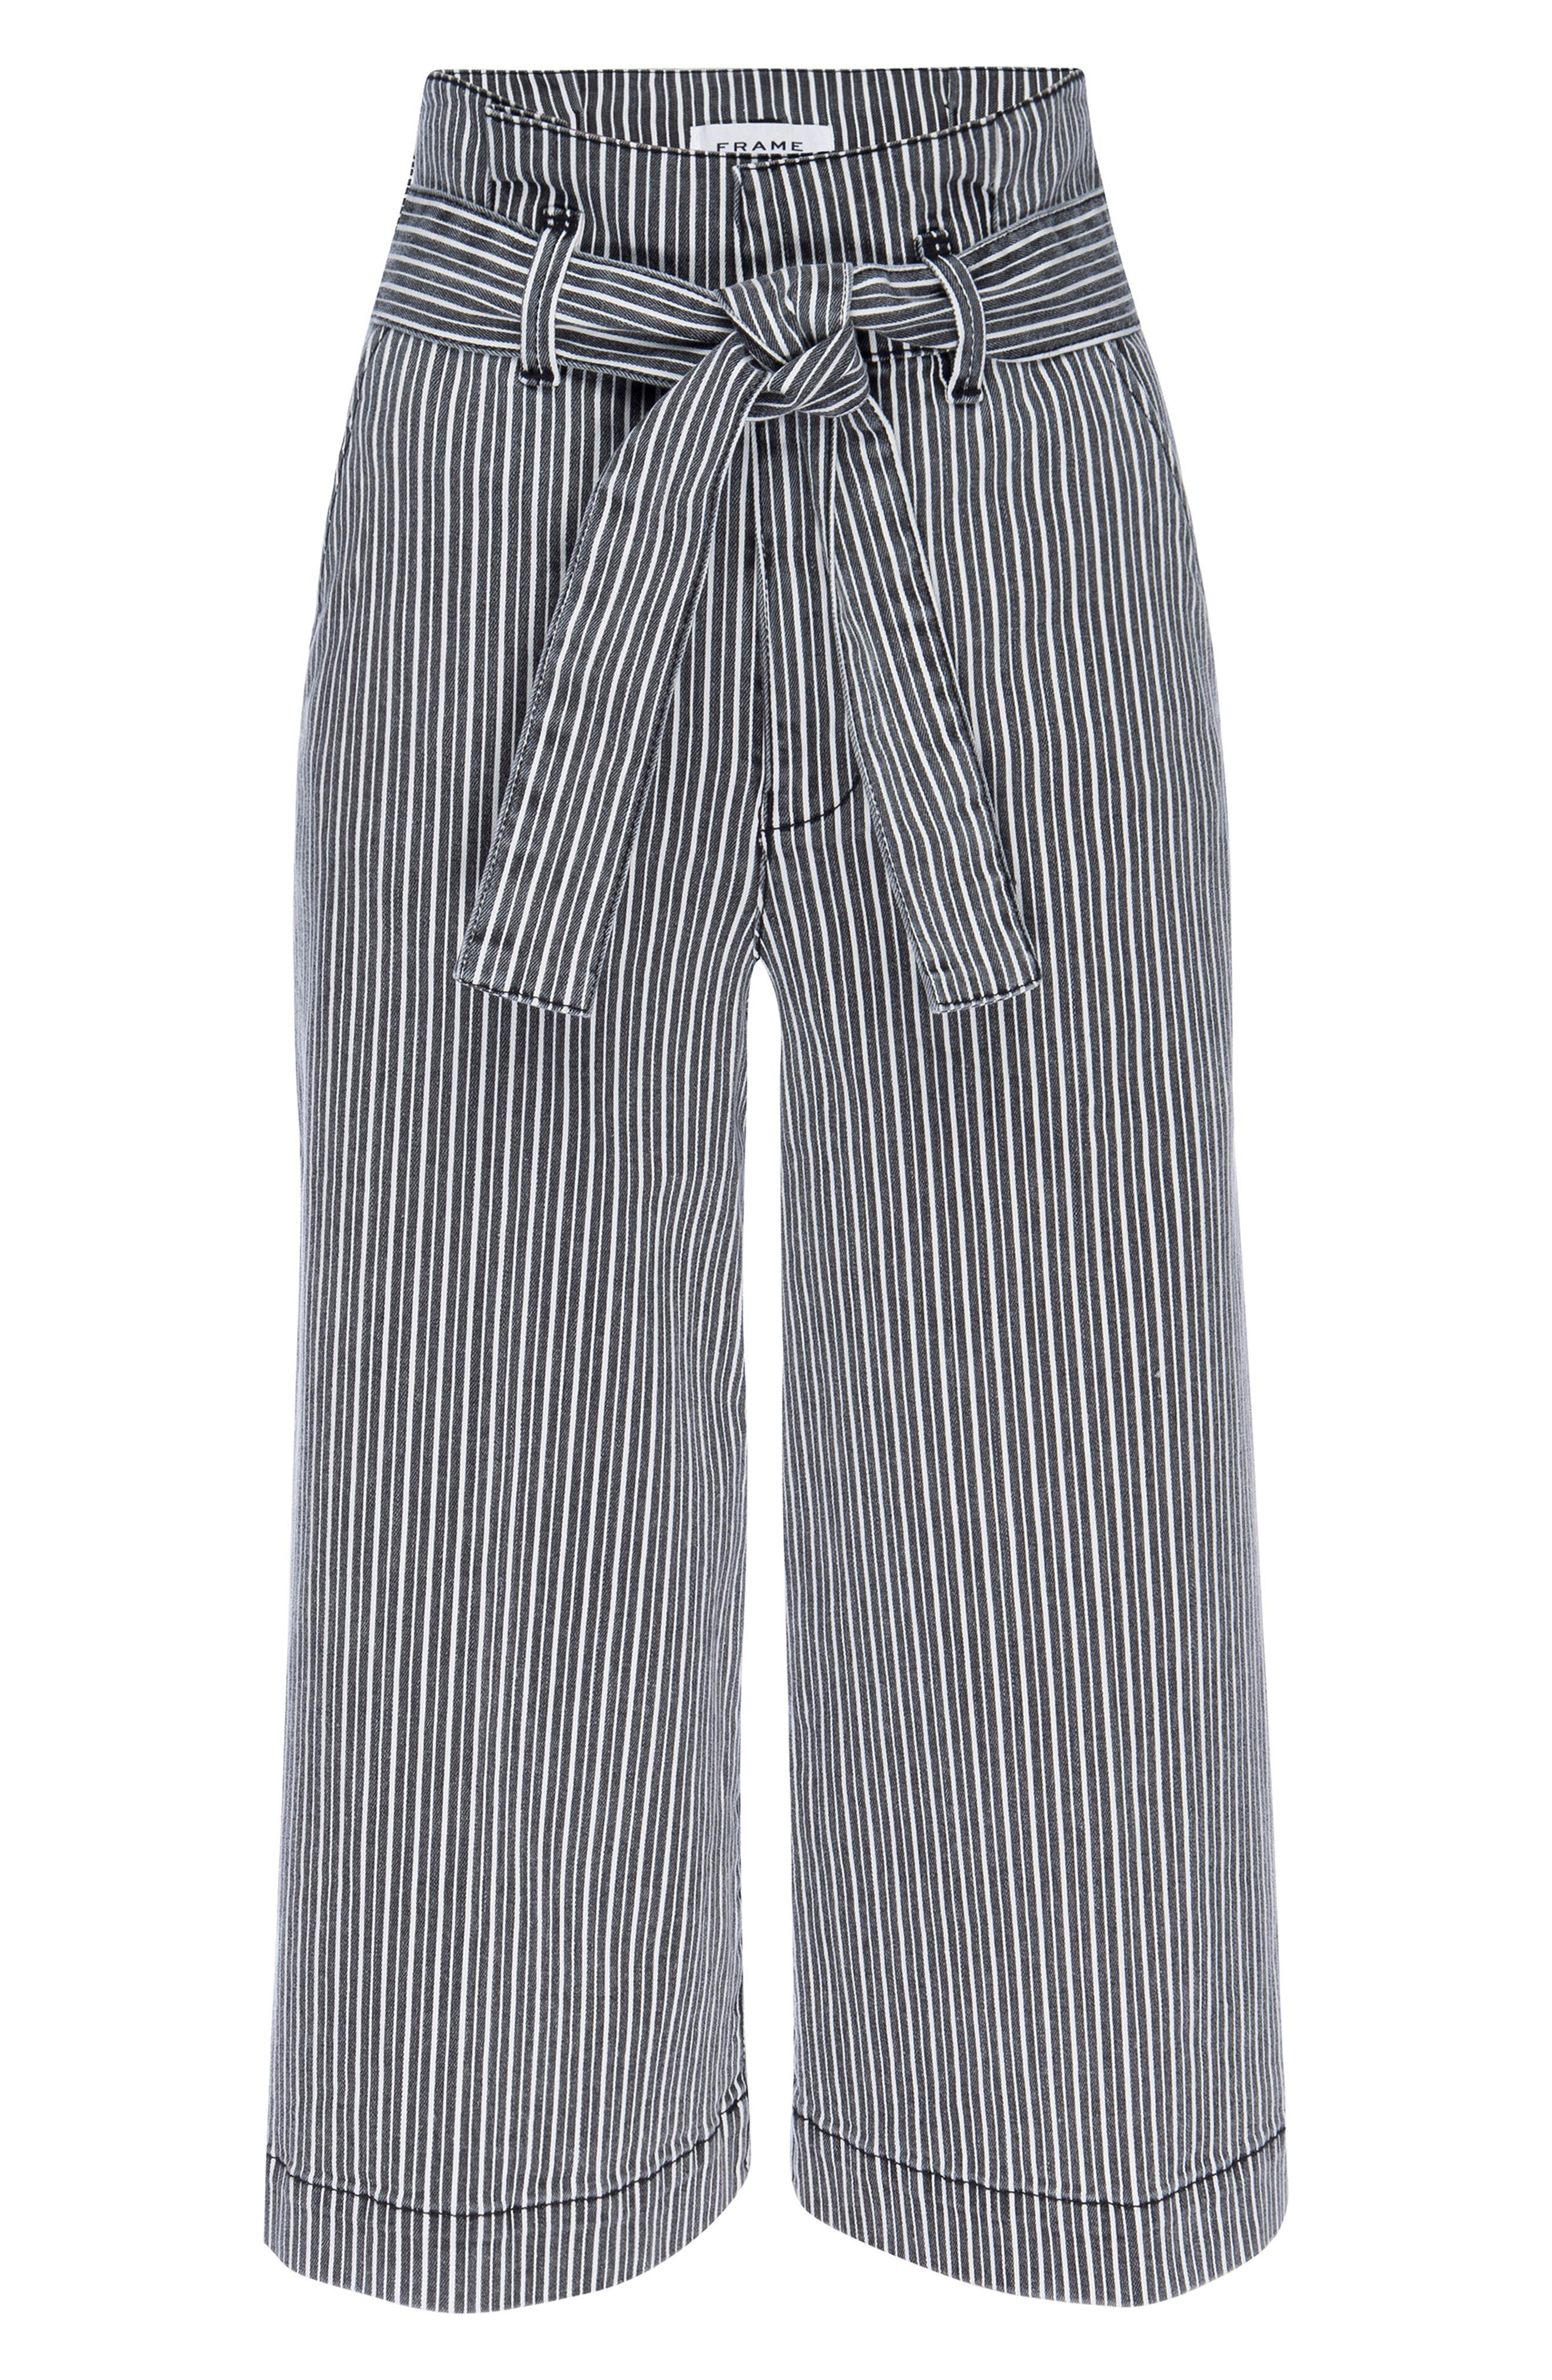 Image of FRAME Stripe Waist Belt Pleated Culotte Pants